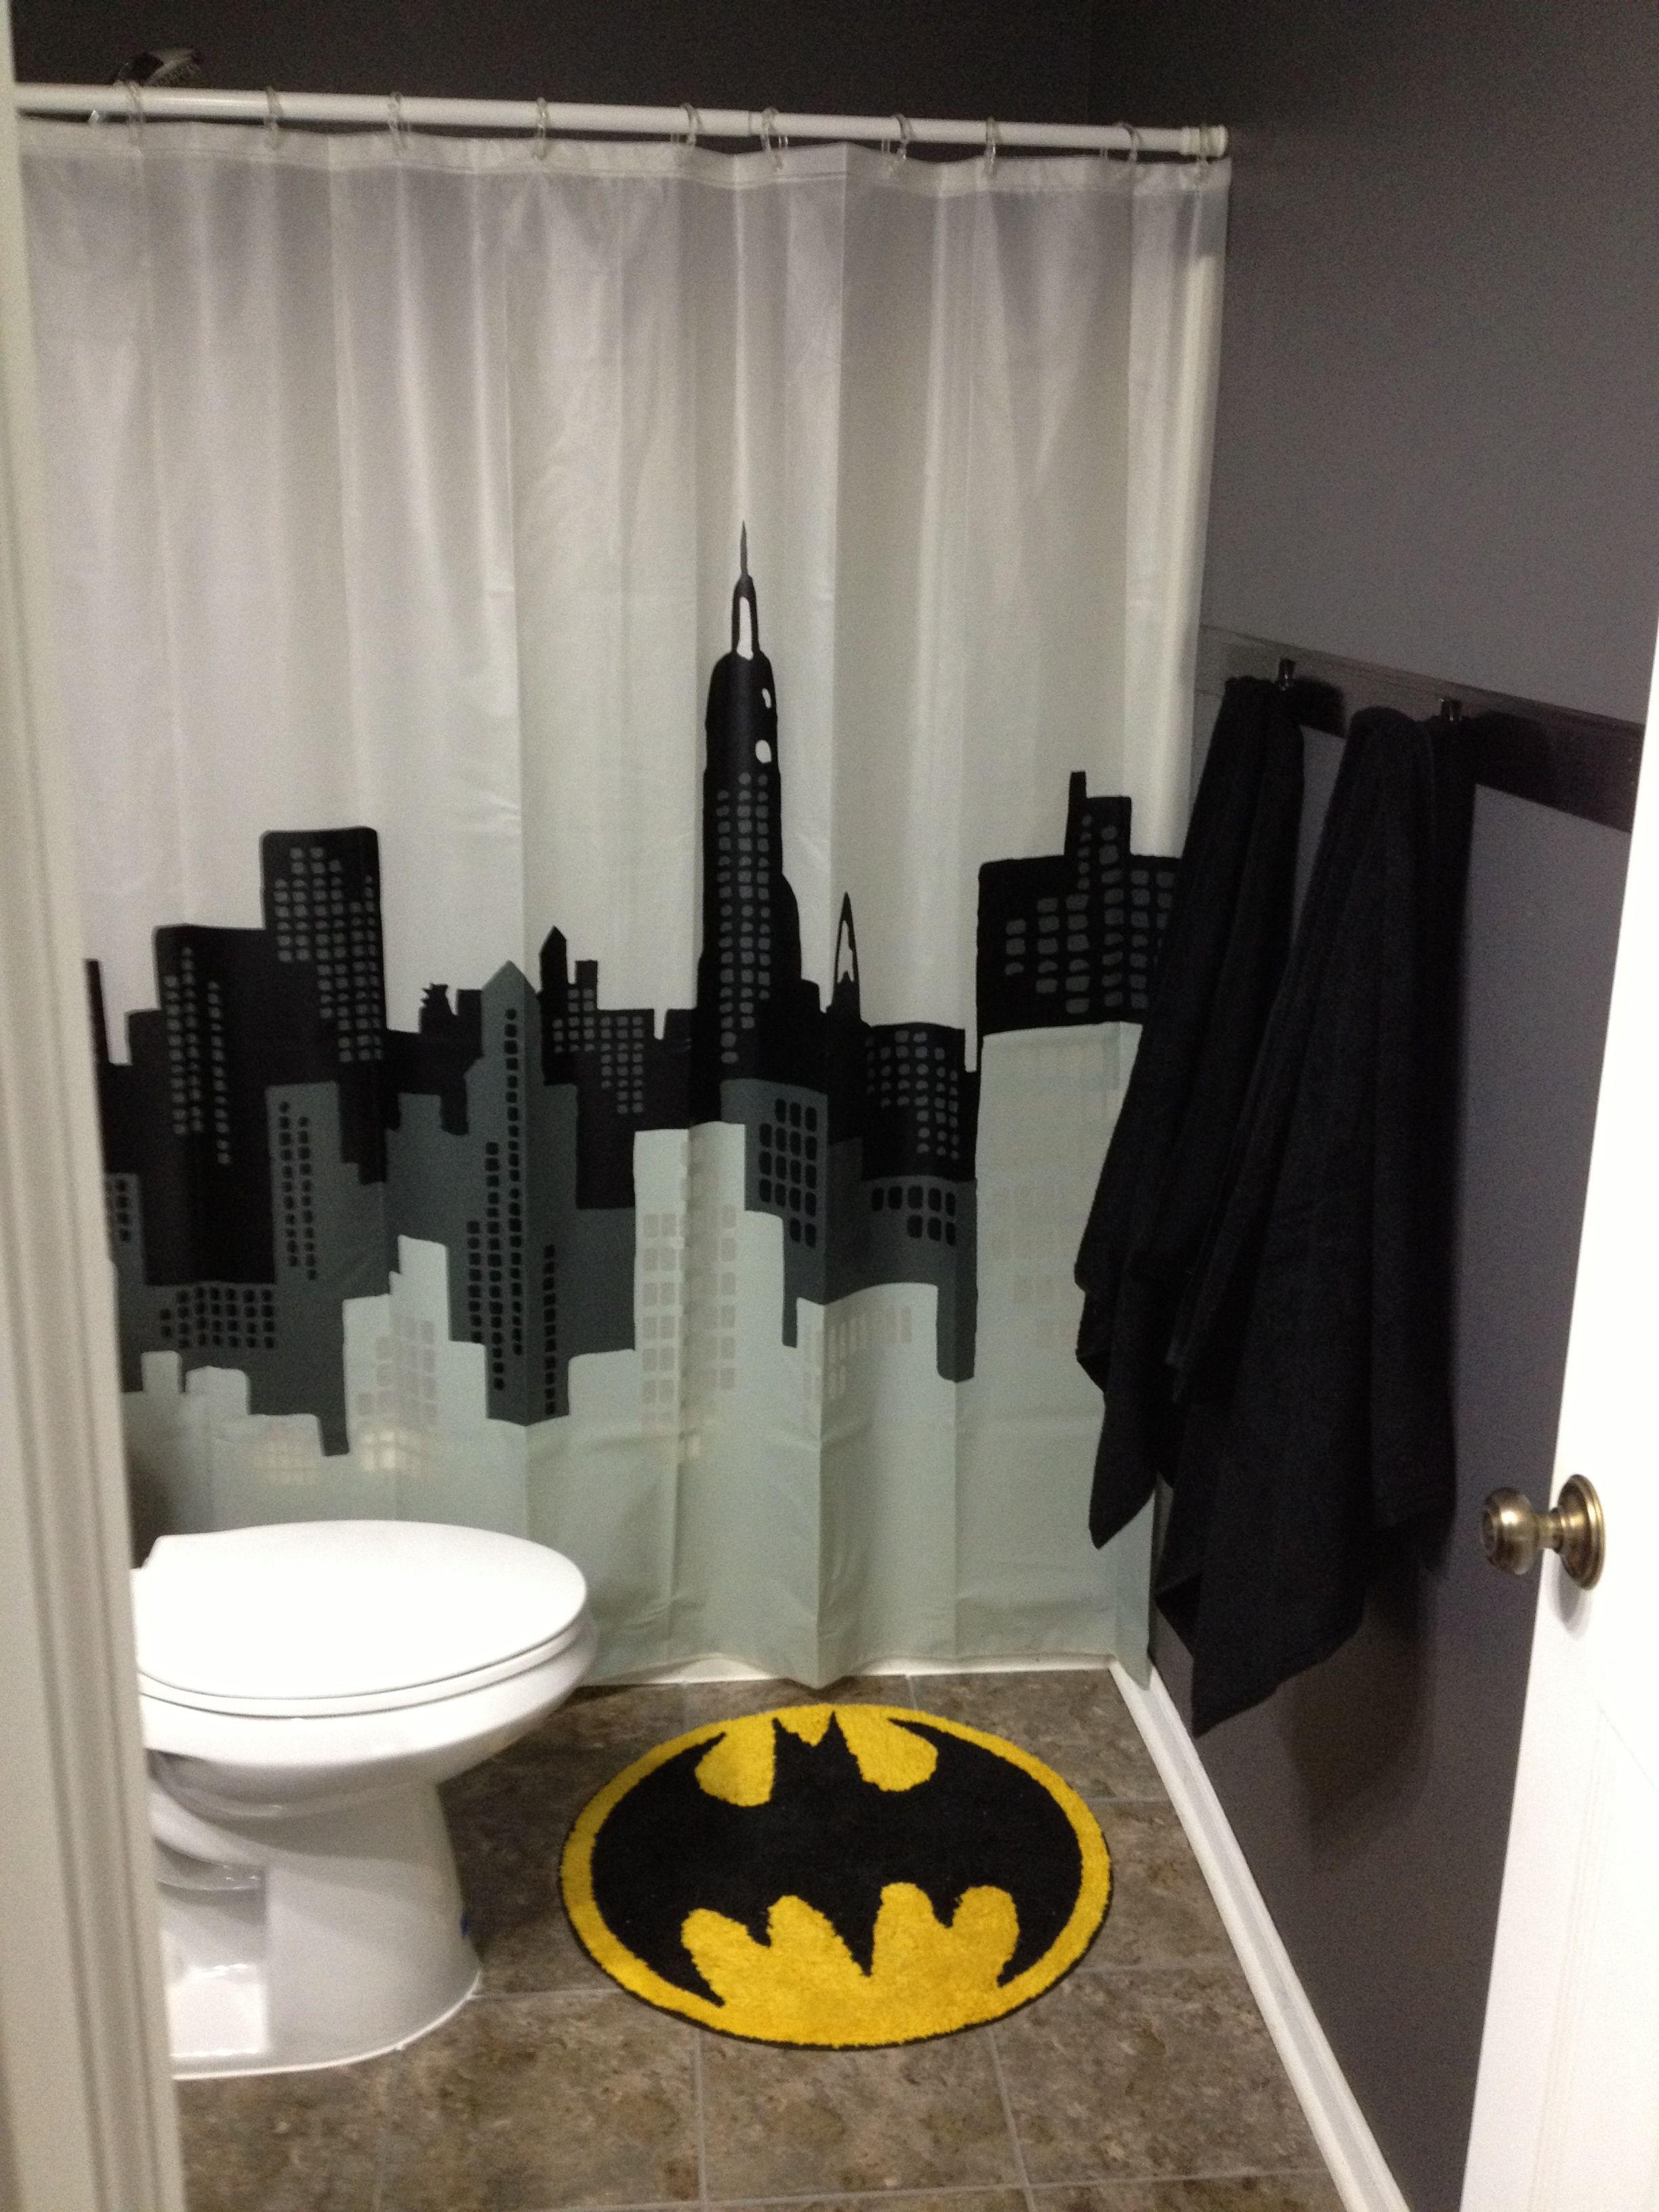 Batman Bathroom For Downstairs Near Mancave And Kids Rec Room